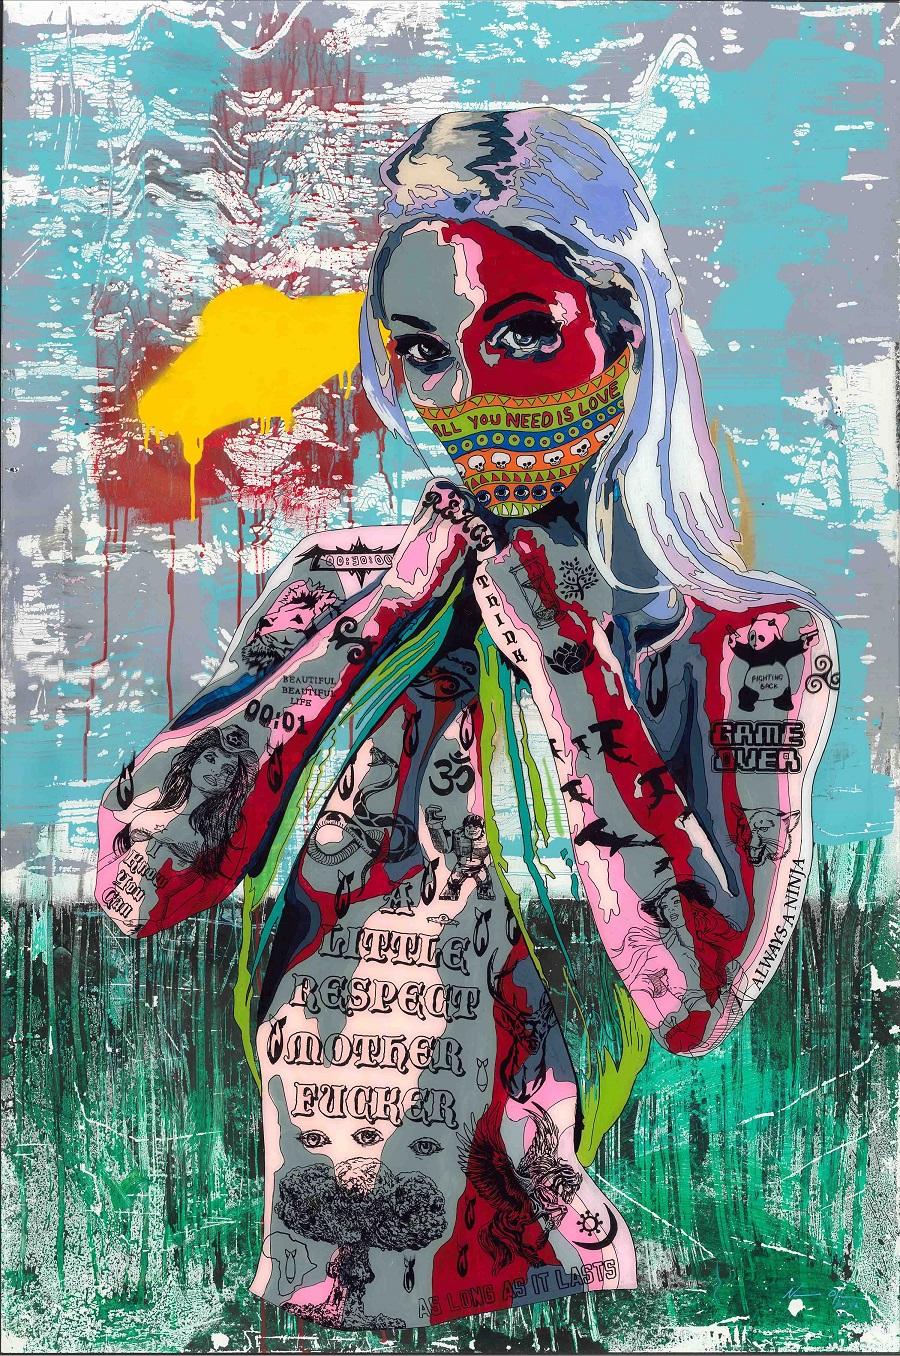 [Art Supermarket] Norman O'Flynn_Timekeeper37_All you need is love_Lightbox_150x100x10cm.jpg